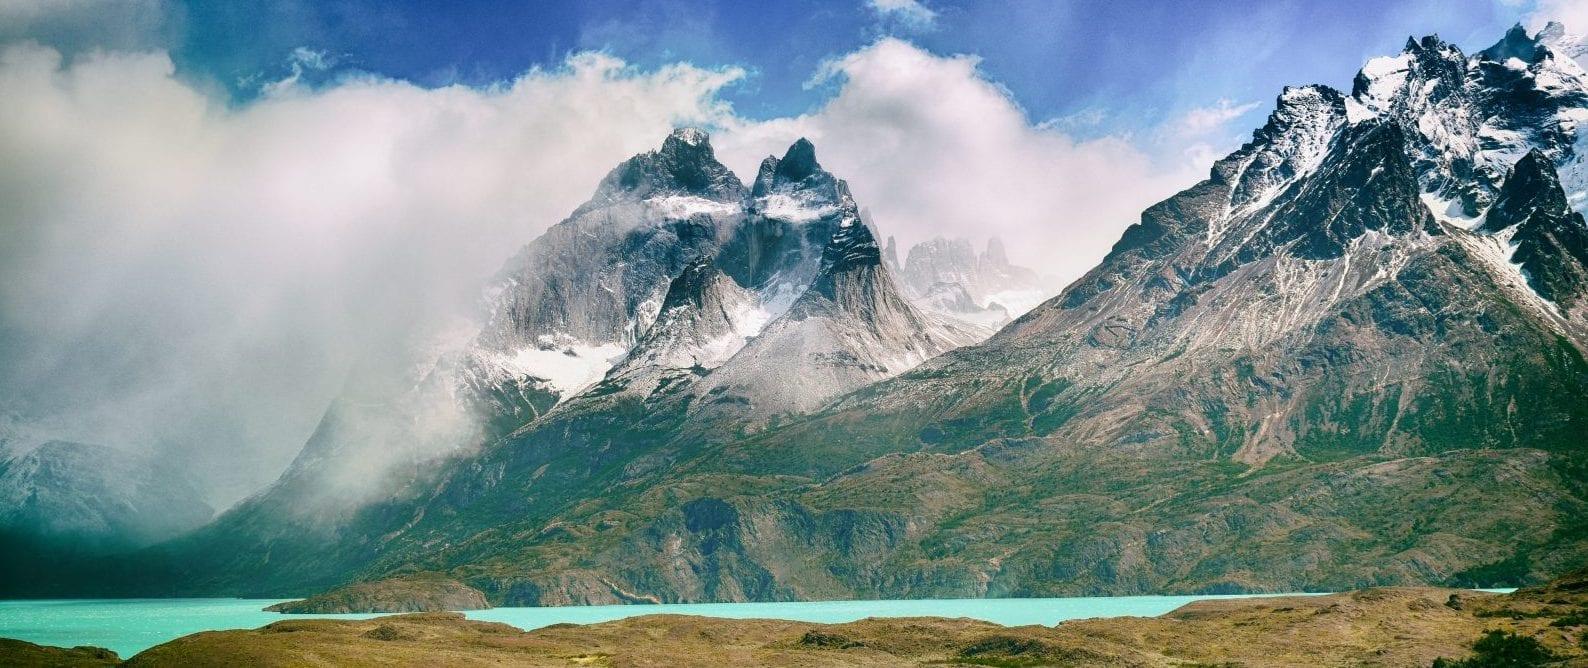 Chile Trekking Adventure